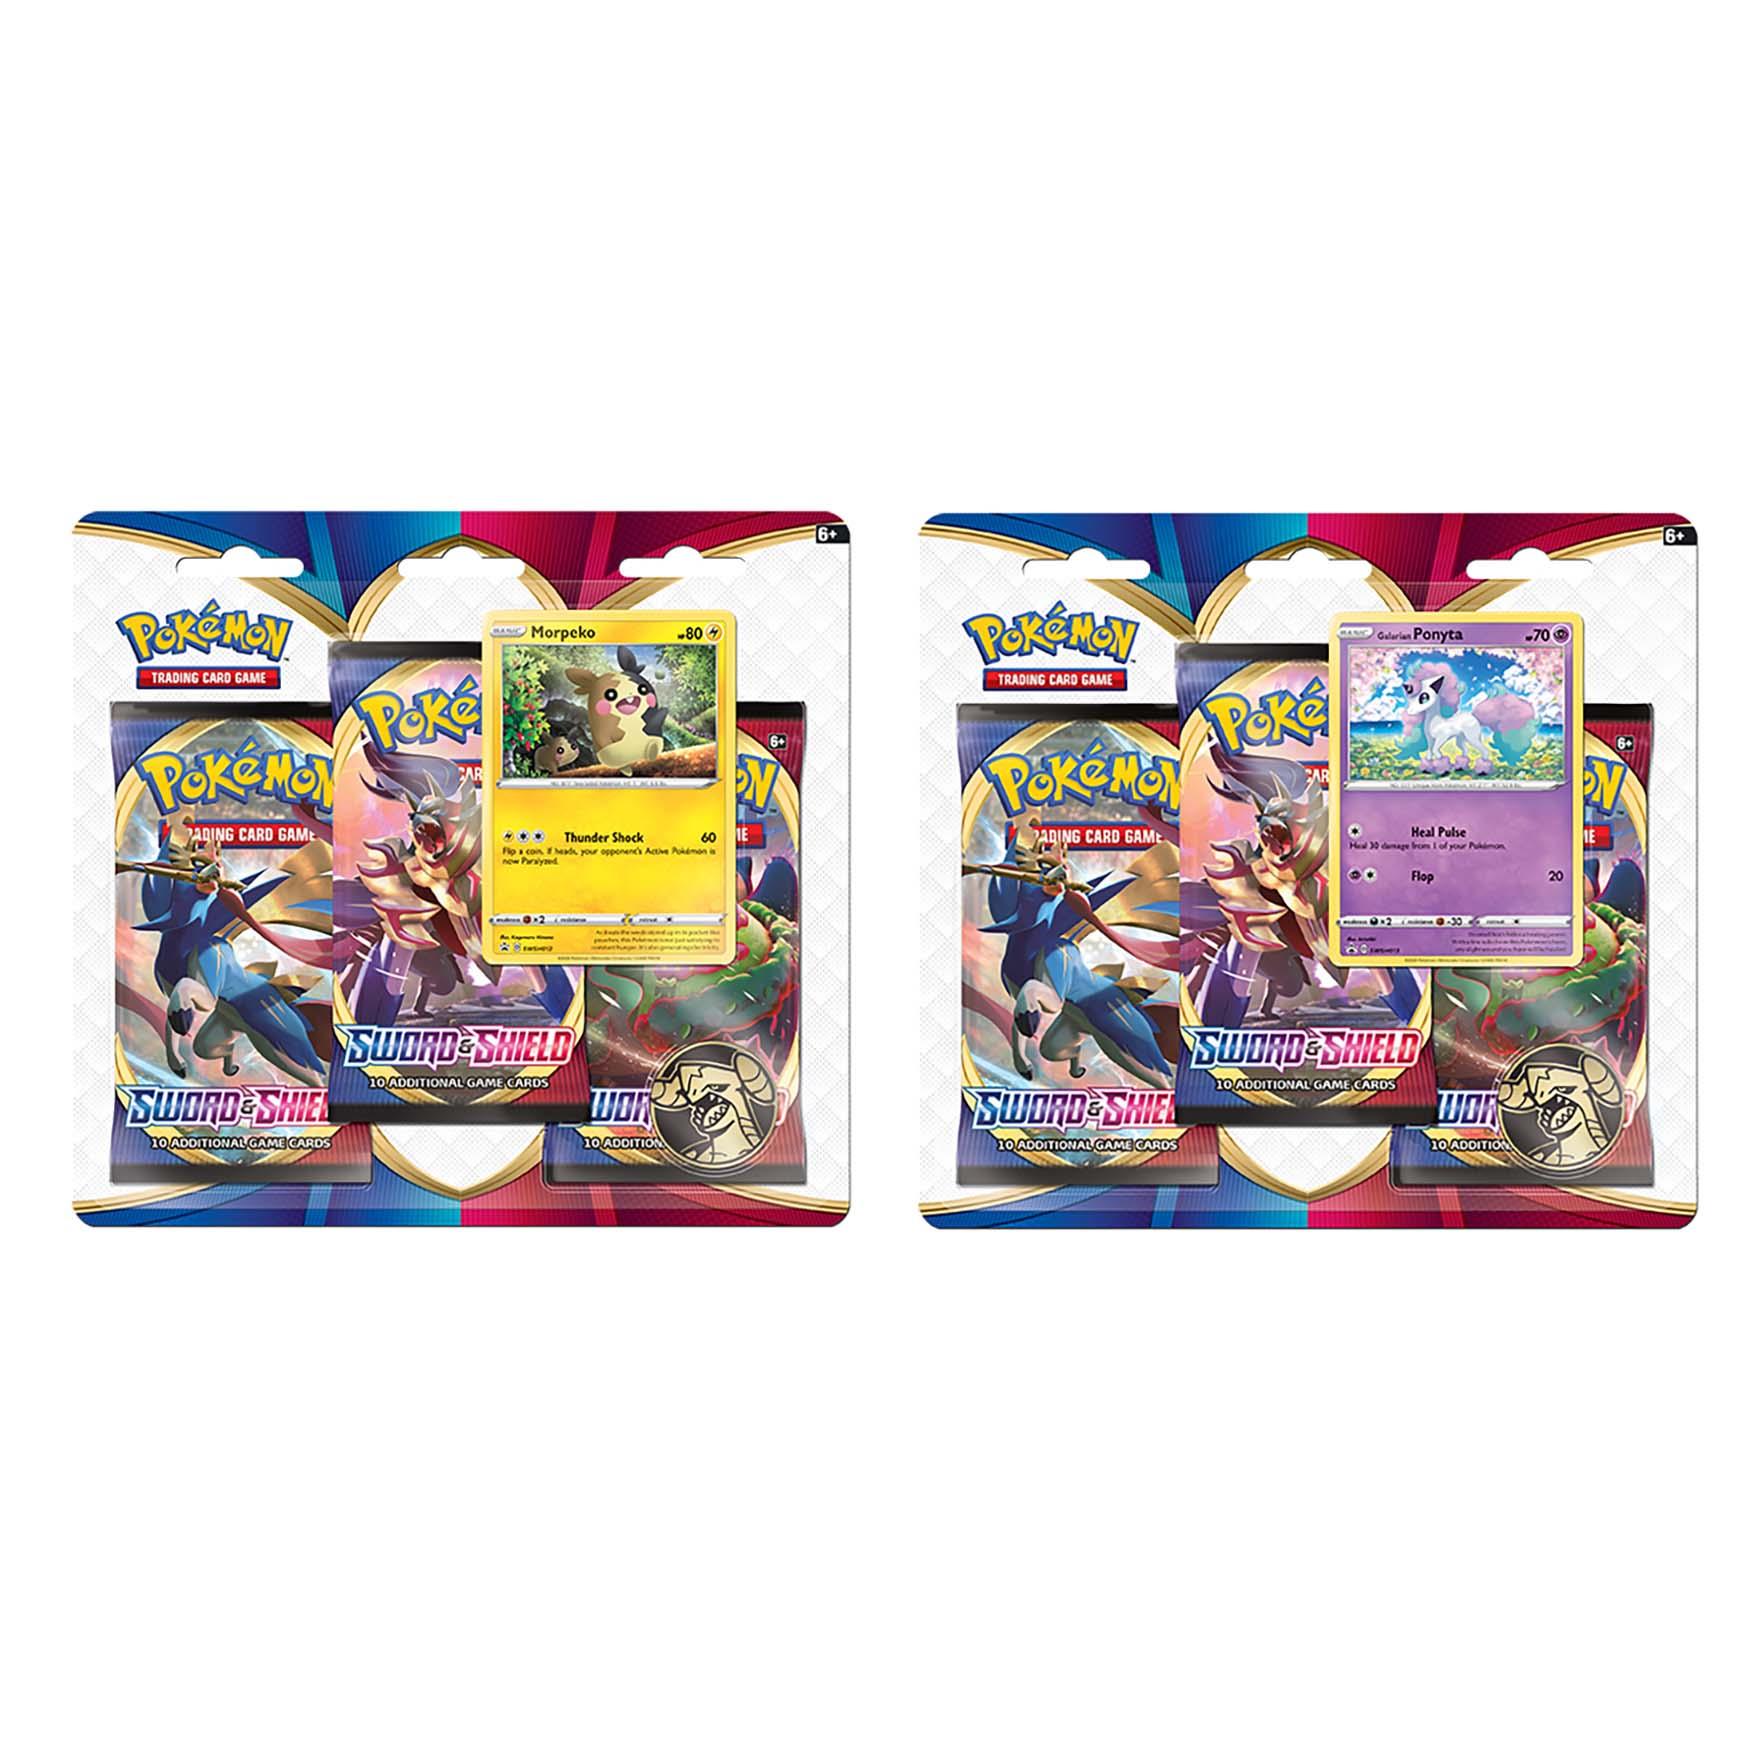 Afbeelding van Pokémon Sword & Shield 3Boosterblister